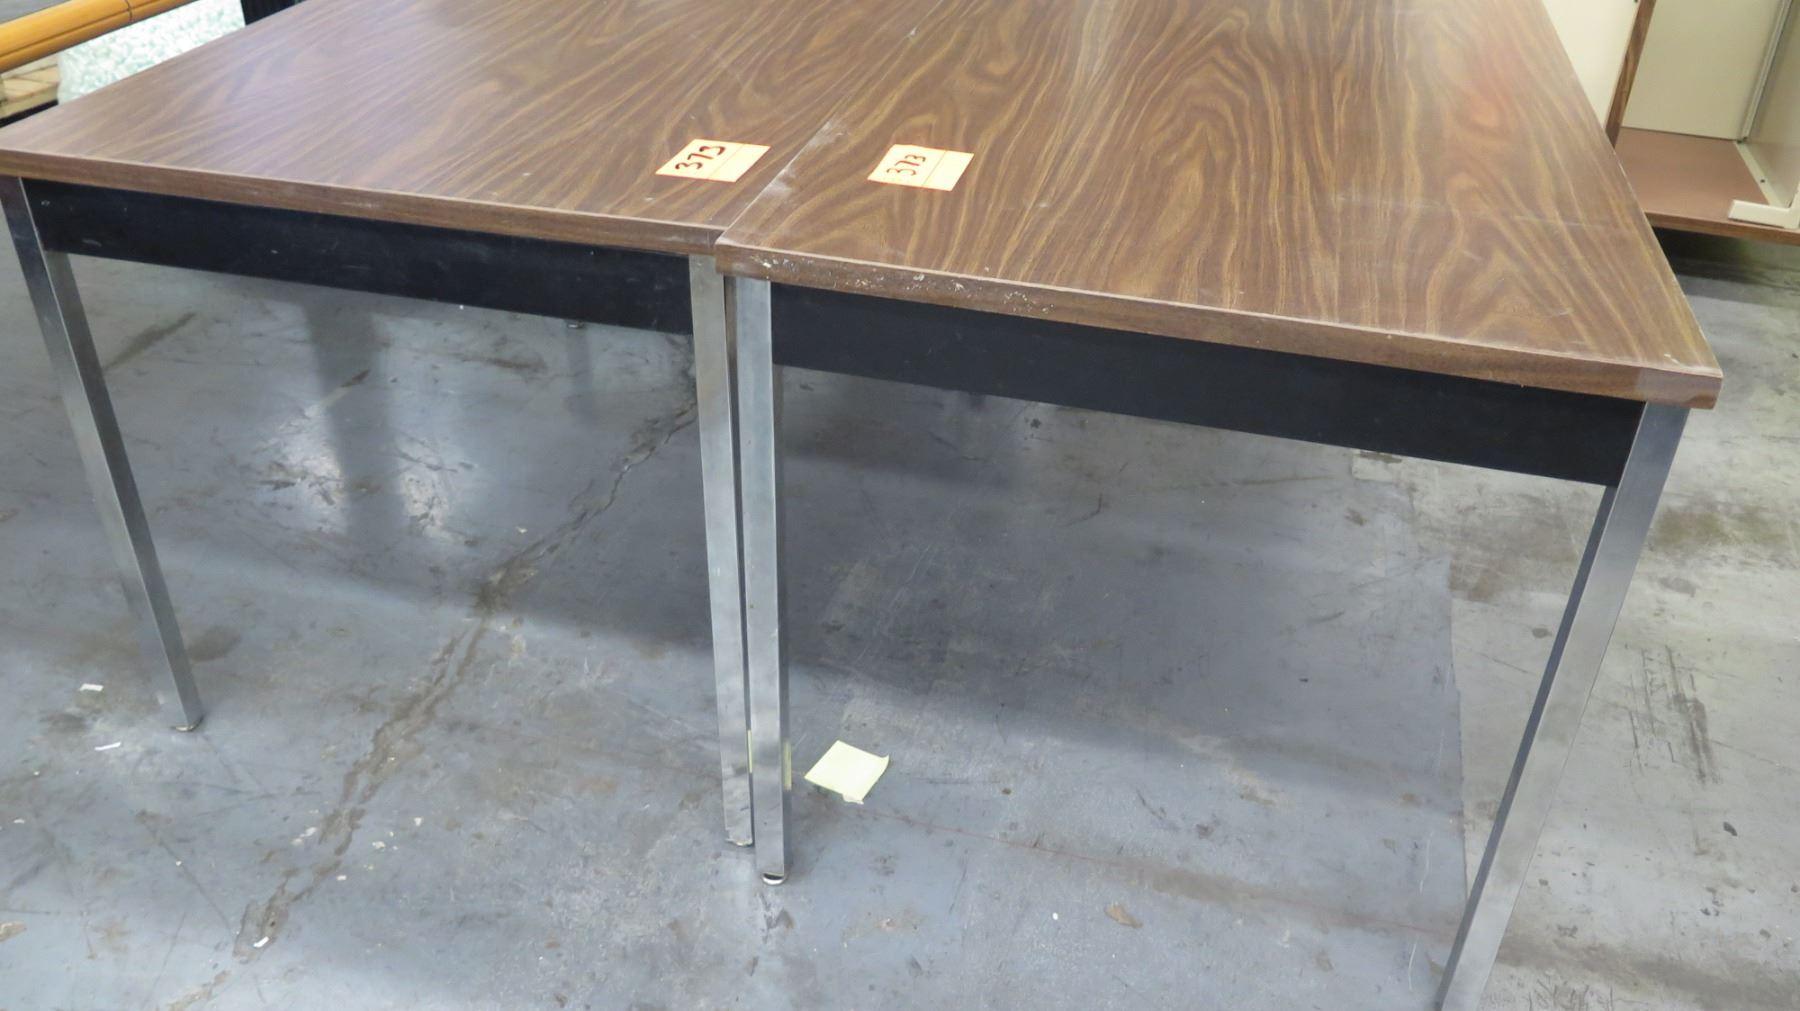 Qty 2 Tables w/ Metal Legs & Pressed Wood Table Tops - Oahu